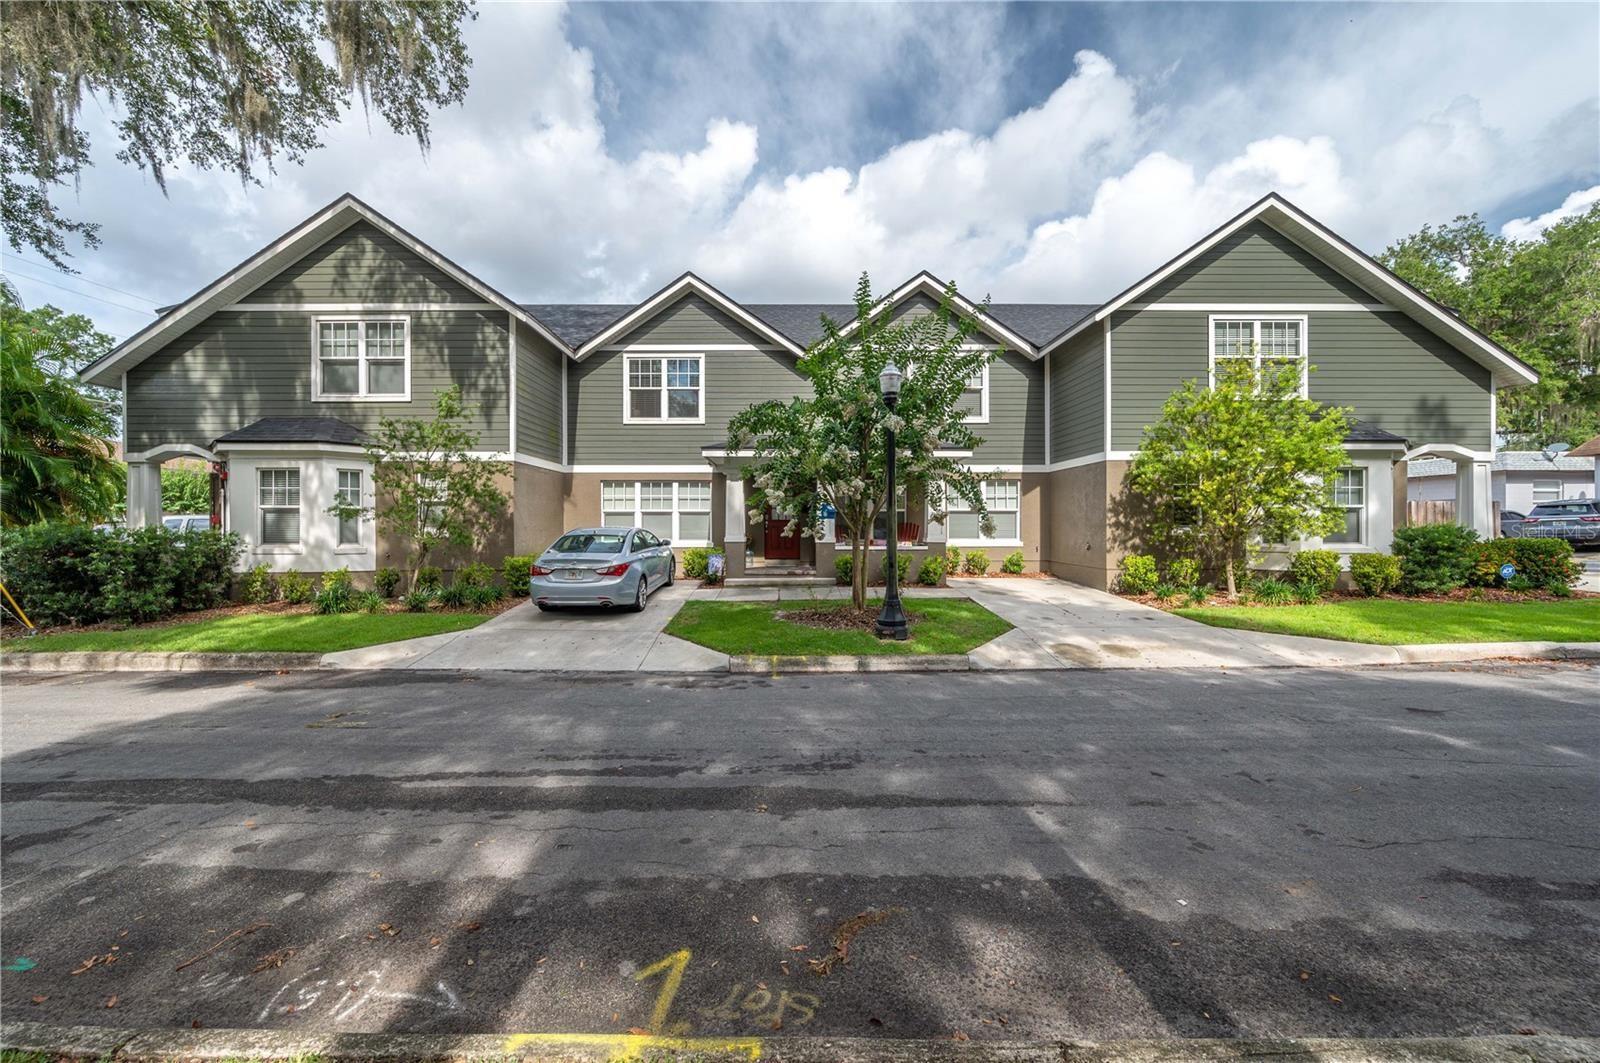 1065 S TENNESSEE AVENUE, Lakeland, FL 33803 - #: L4923466